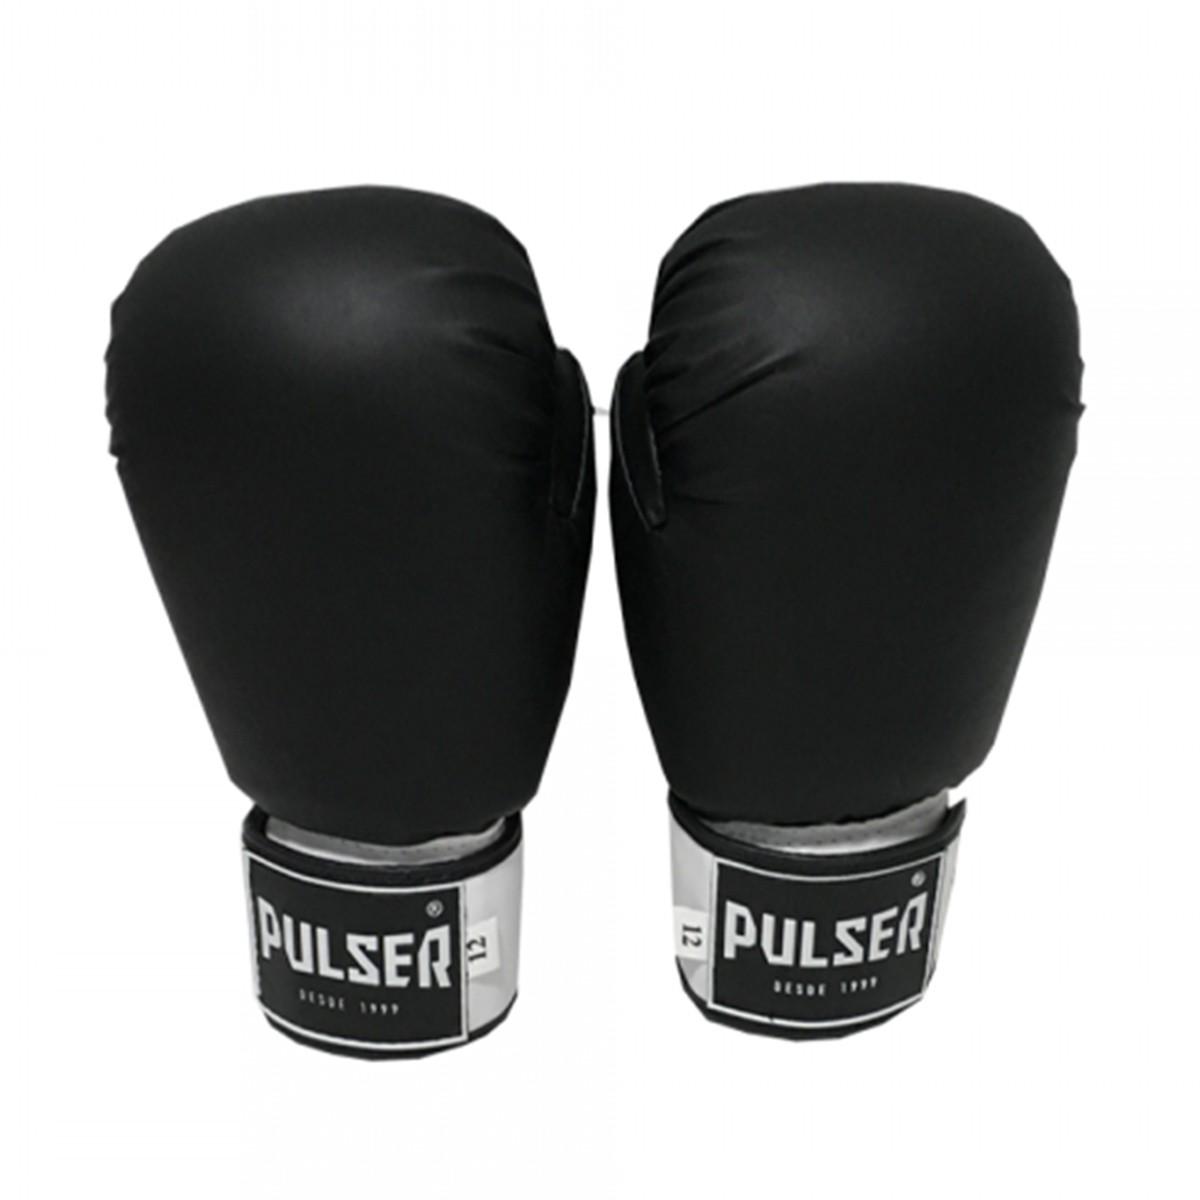 Luva de Boxe / Muay Thai 12oz - Preto - Pulser  - PRALUTA SHOP